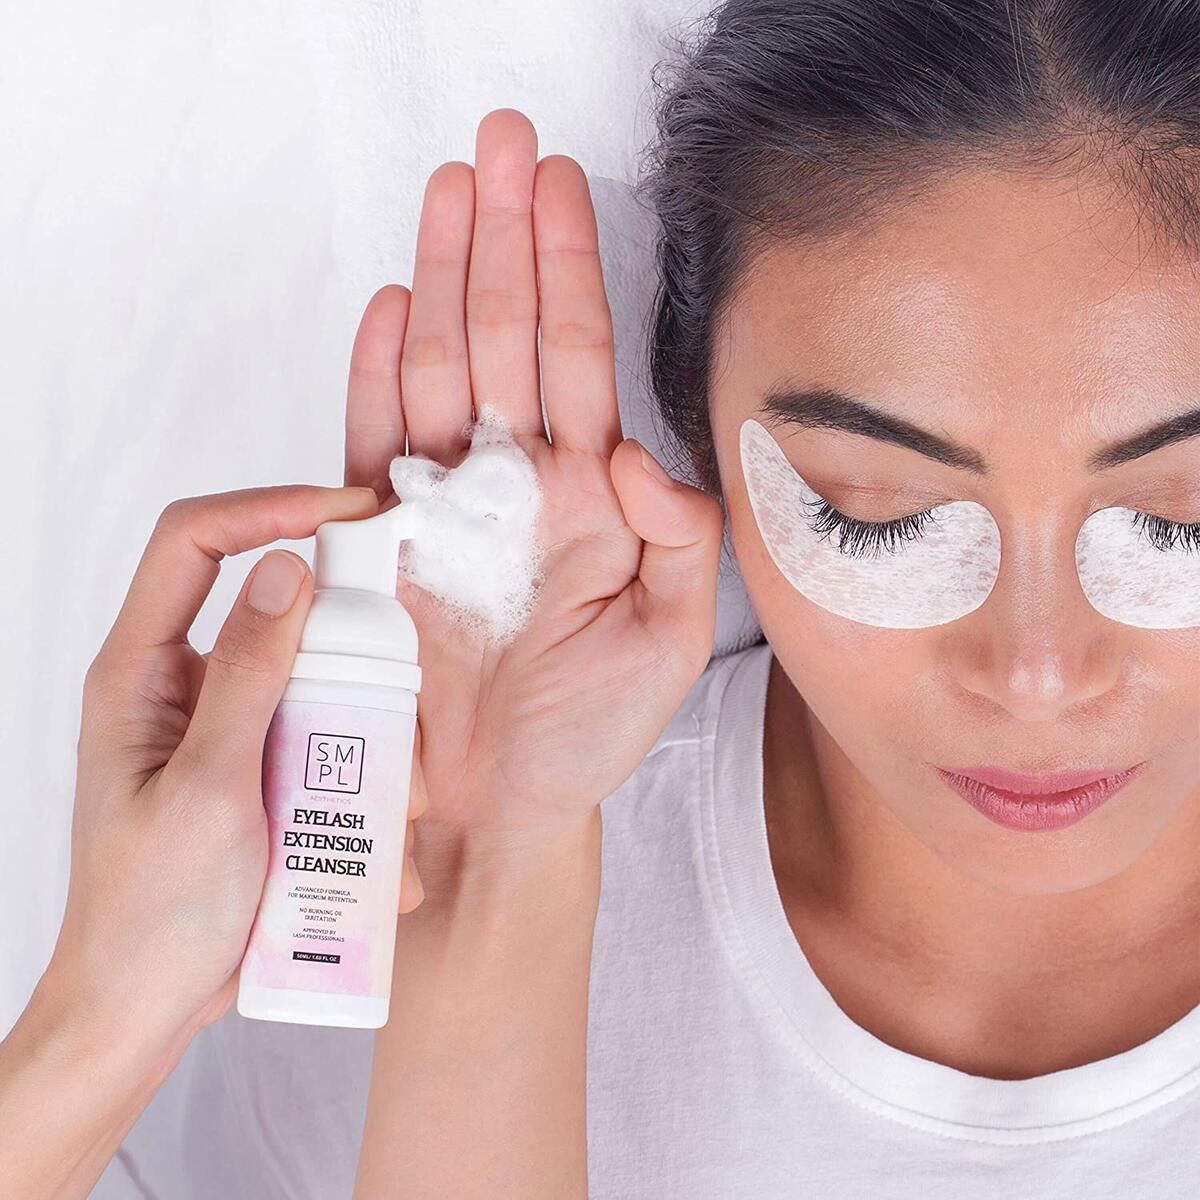 SMPL Aesthetics Eyelash Extension Shampoo Kit – Lash / Eyelid Cleanser for Extensions + Brush + Rinse Bottle + Free eBook